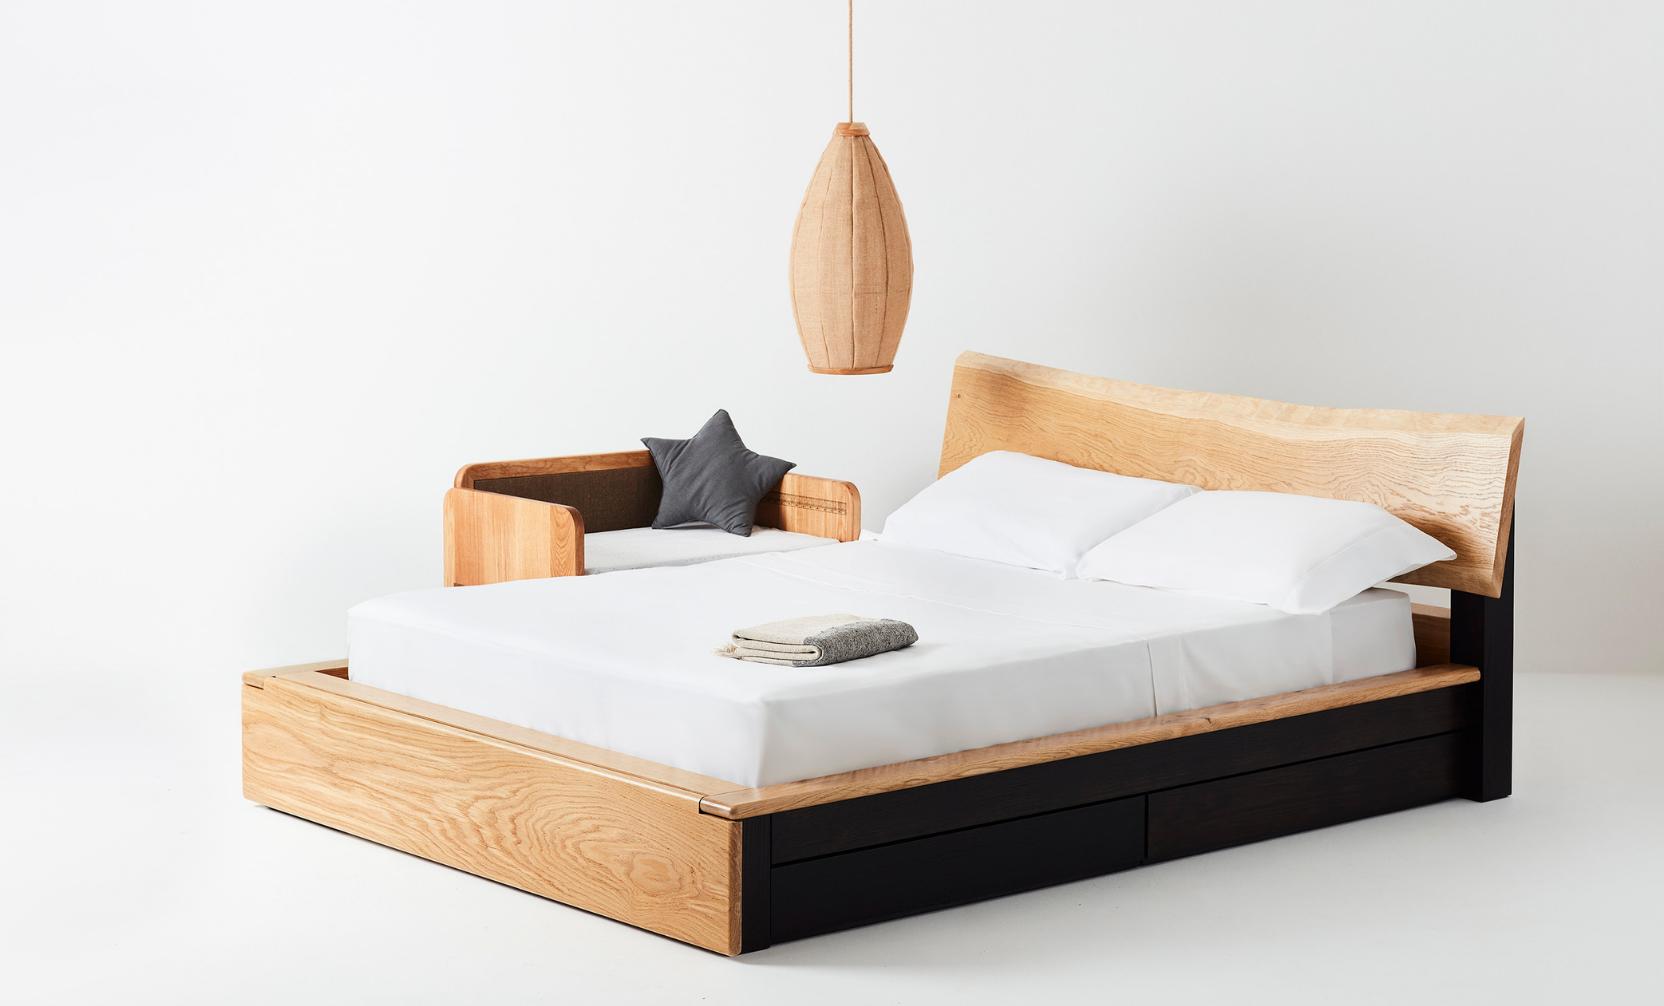 tjukurpa-cama-madera-ekohunters